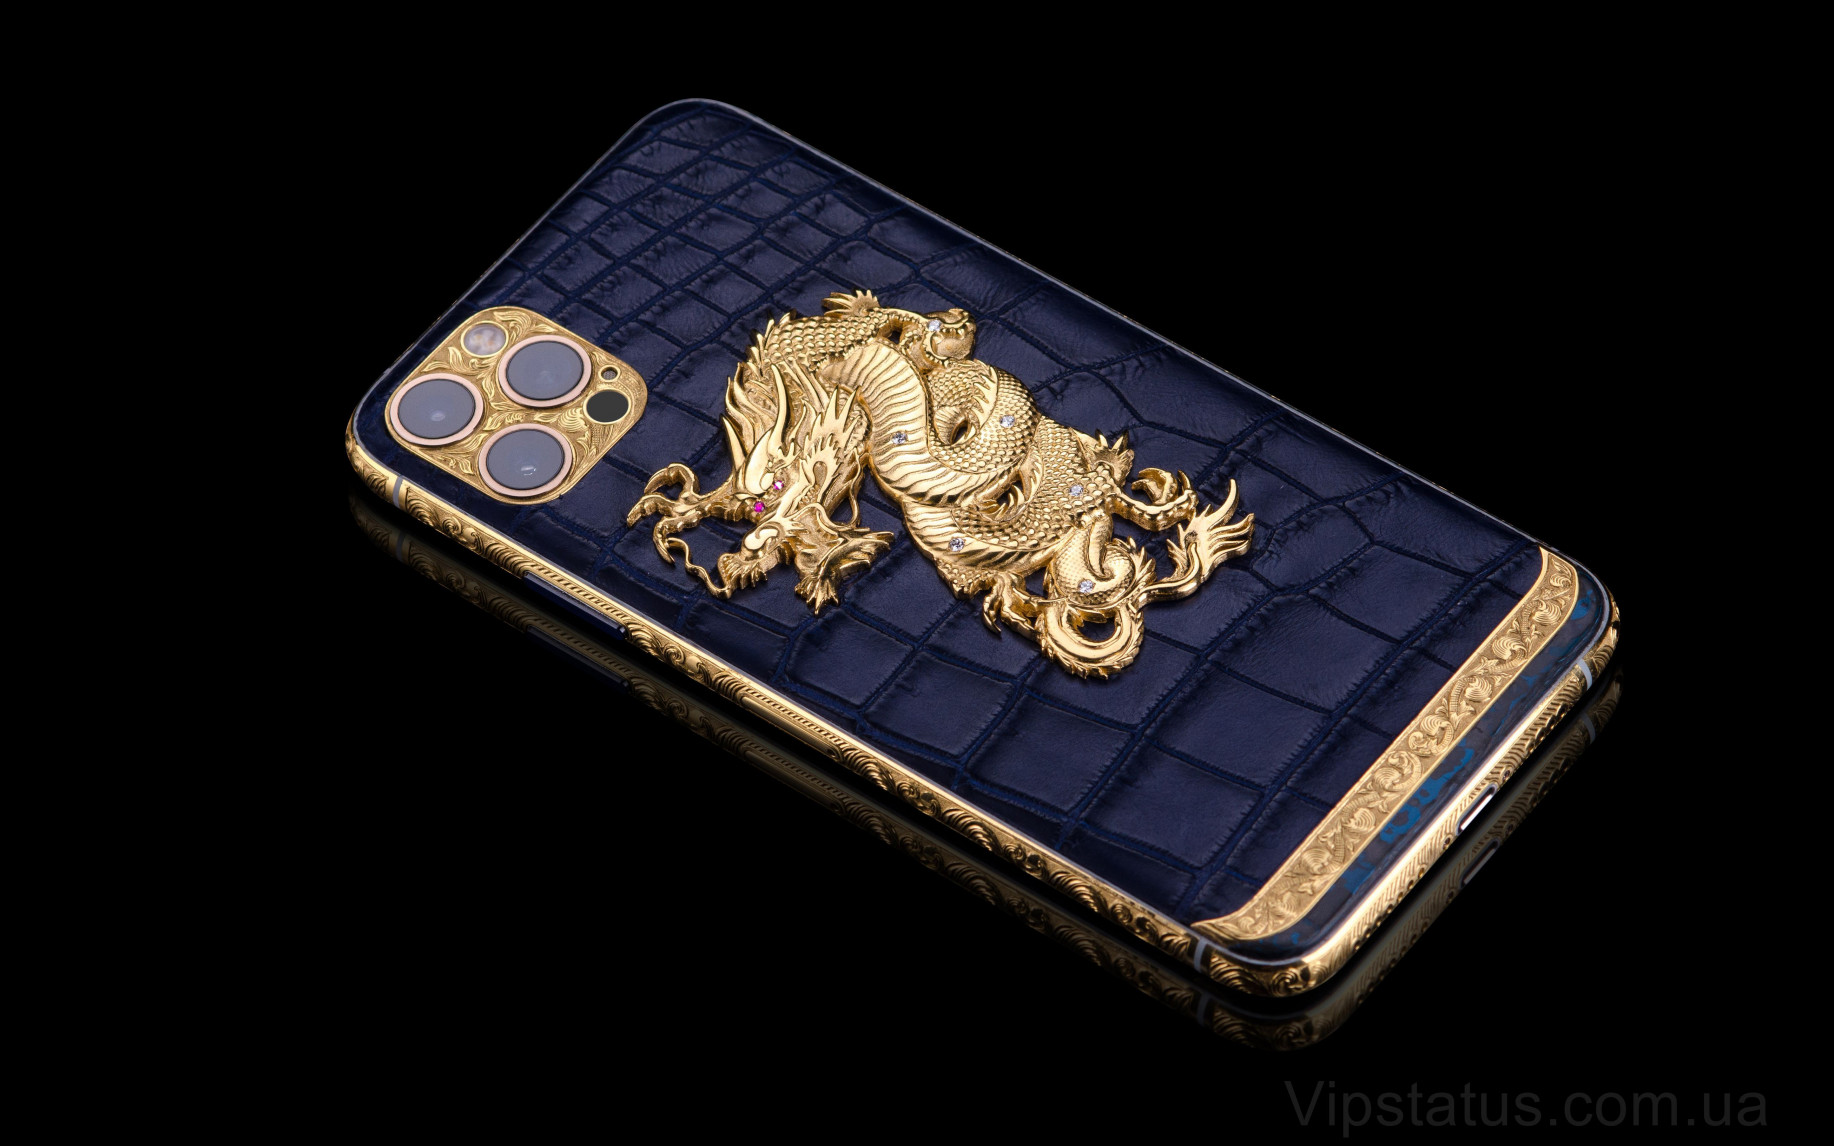 Elite Oriental Dragon IPHONE 12 PRO MAX 512 GB Oriental Dragon IPHONE 12 PRO MAX 512 GB image 3